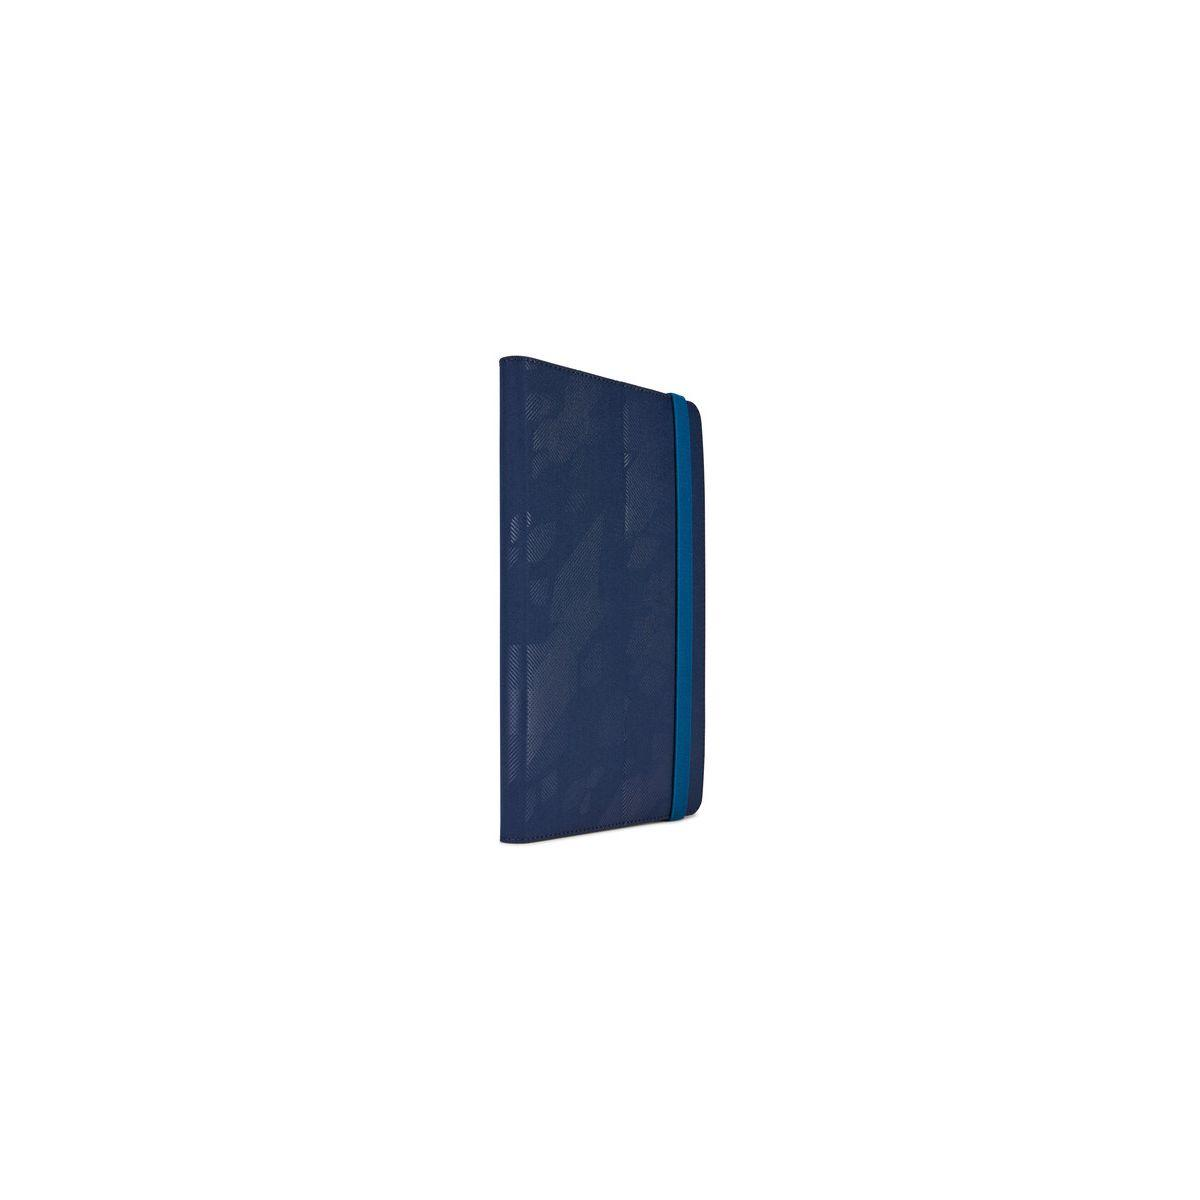 Etui tablette caselogic tablette 7-8'' bleu - livraison offerte : code liv (photo)